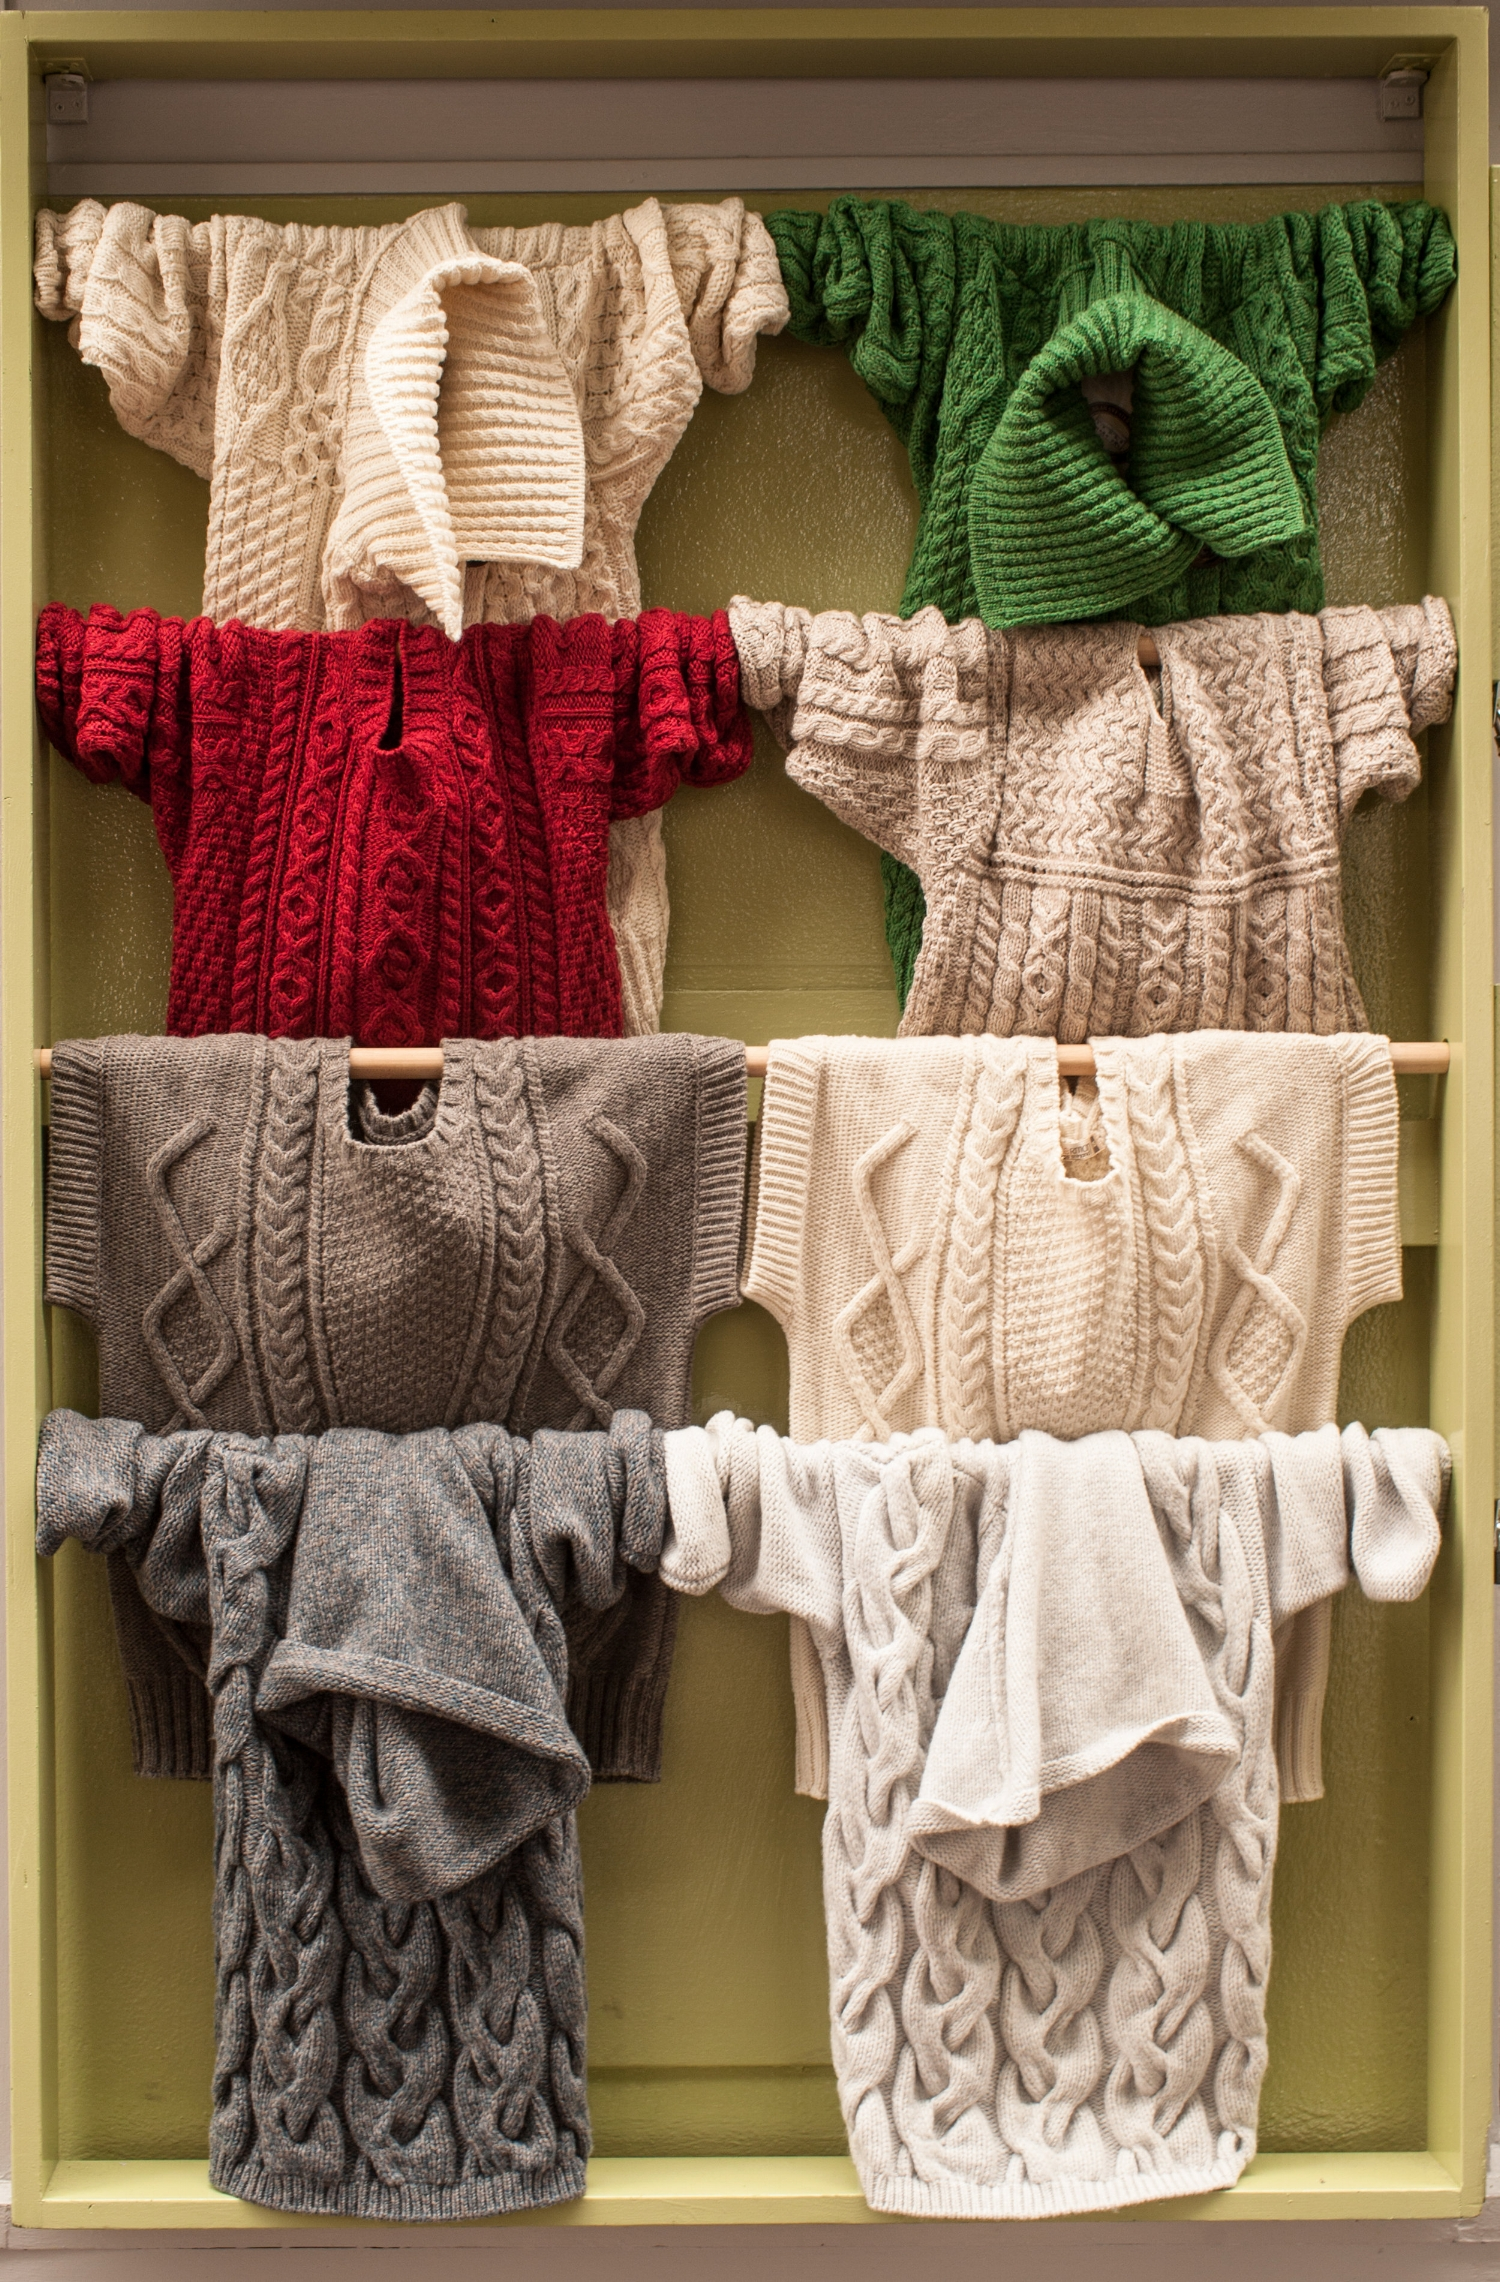 Aran Sweaters from Ireland